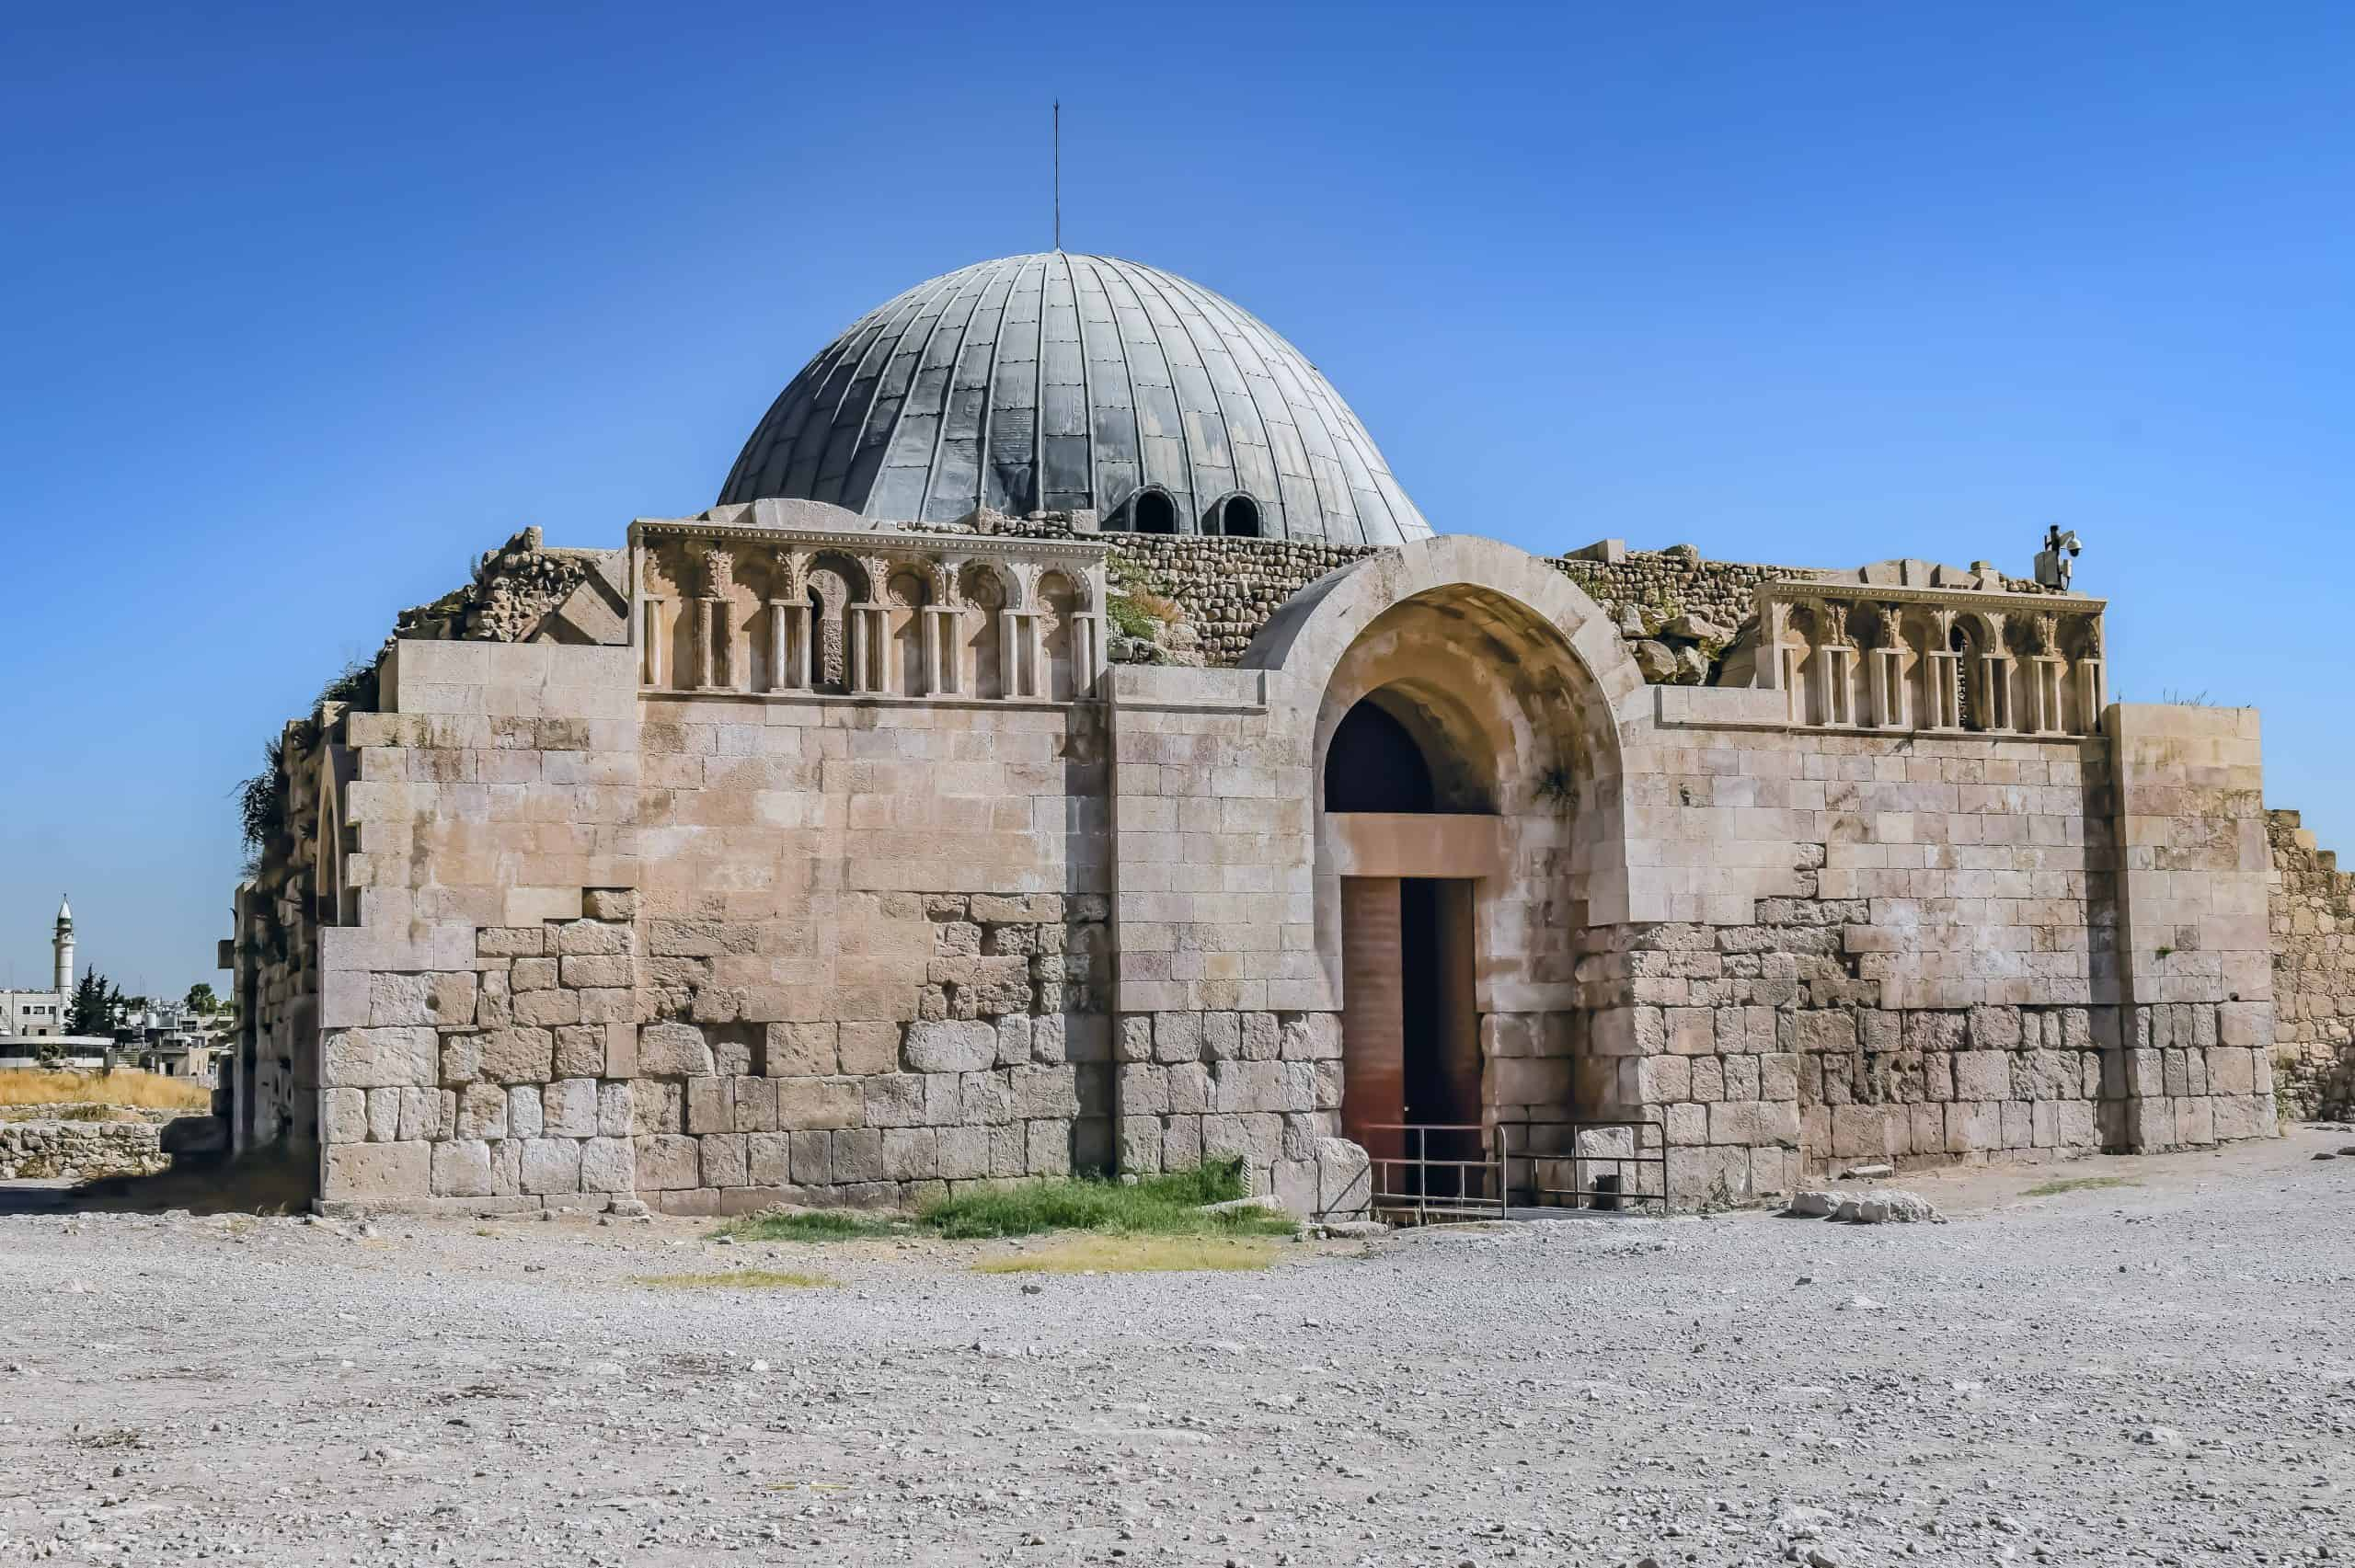 Umayyad Palace, Amman, Jordan